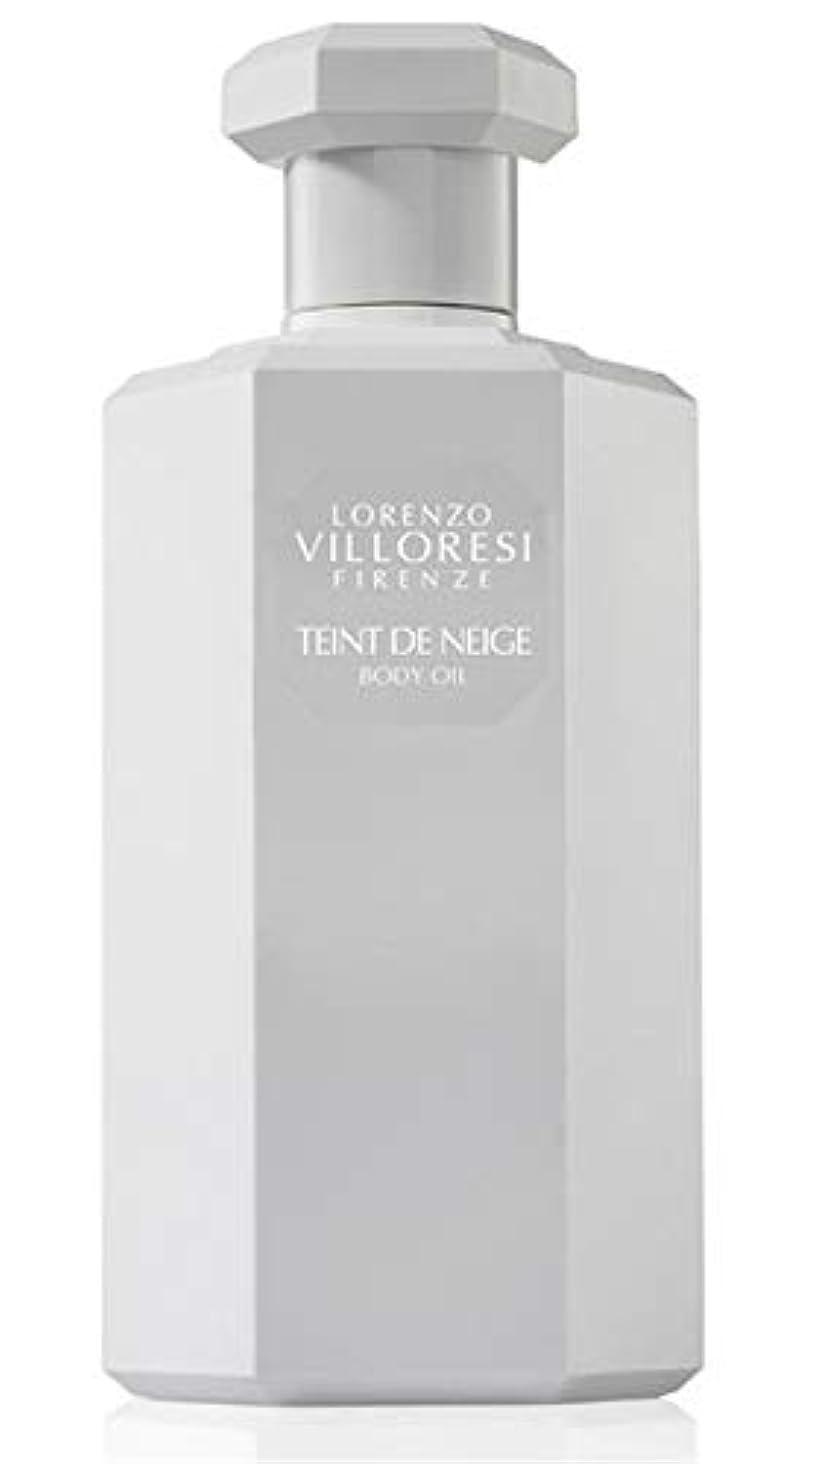 Lorenzo Villoresi Teint De Neige Body Oil 250 ml New in Box